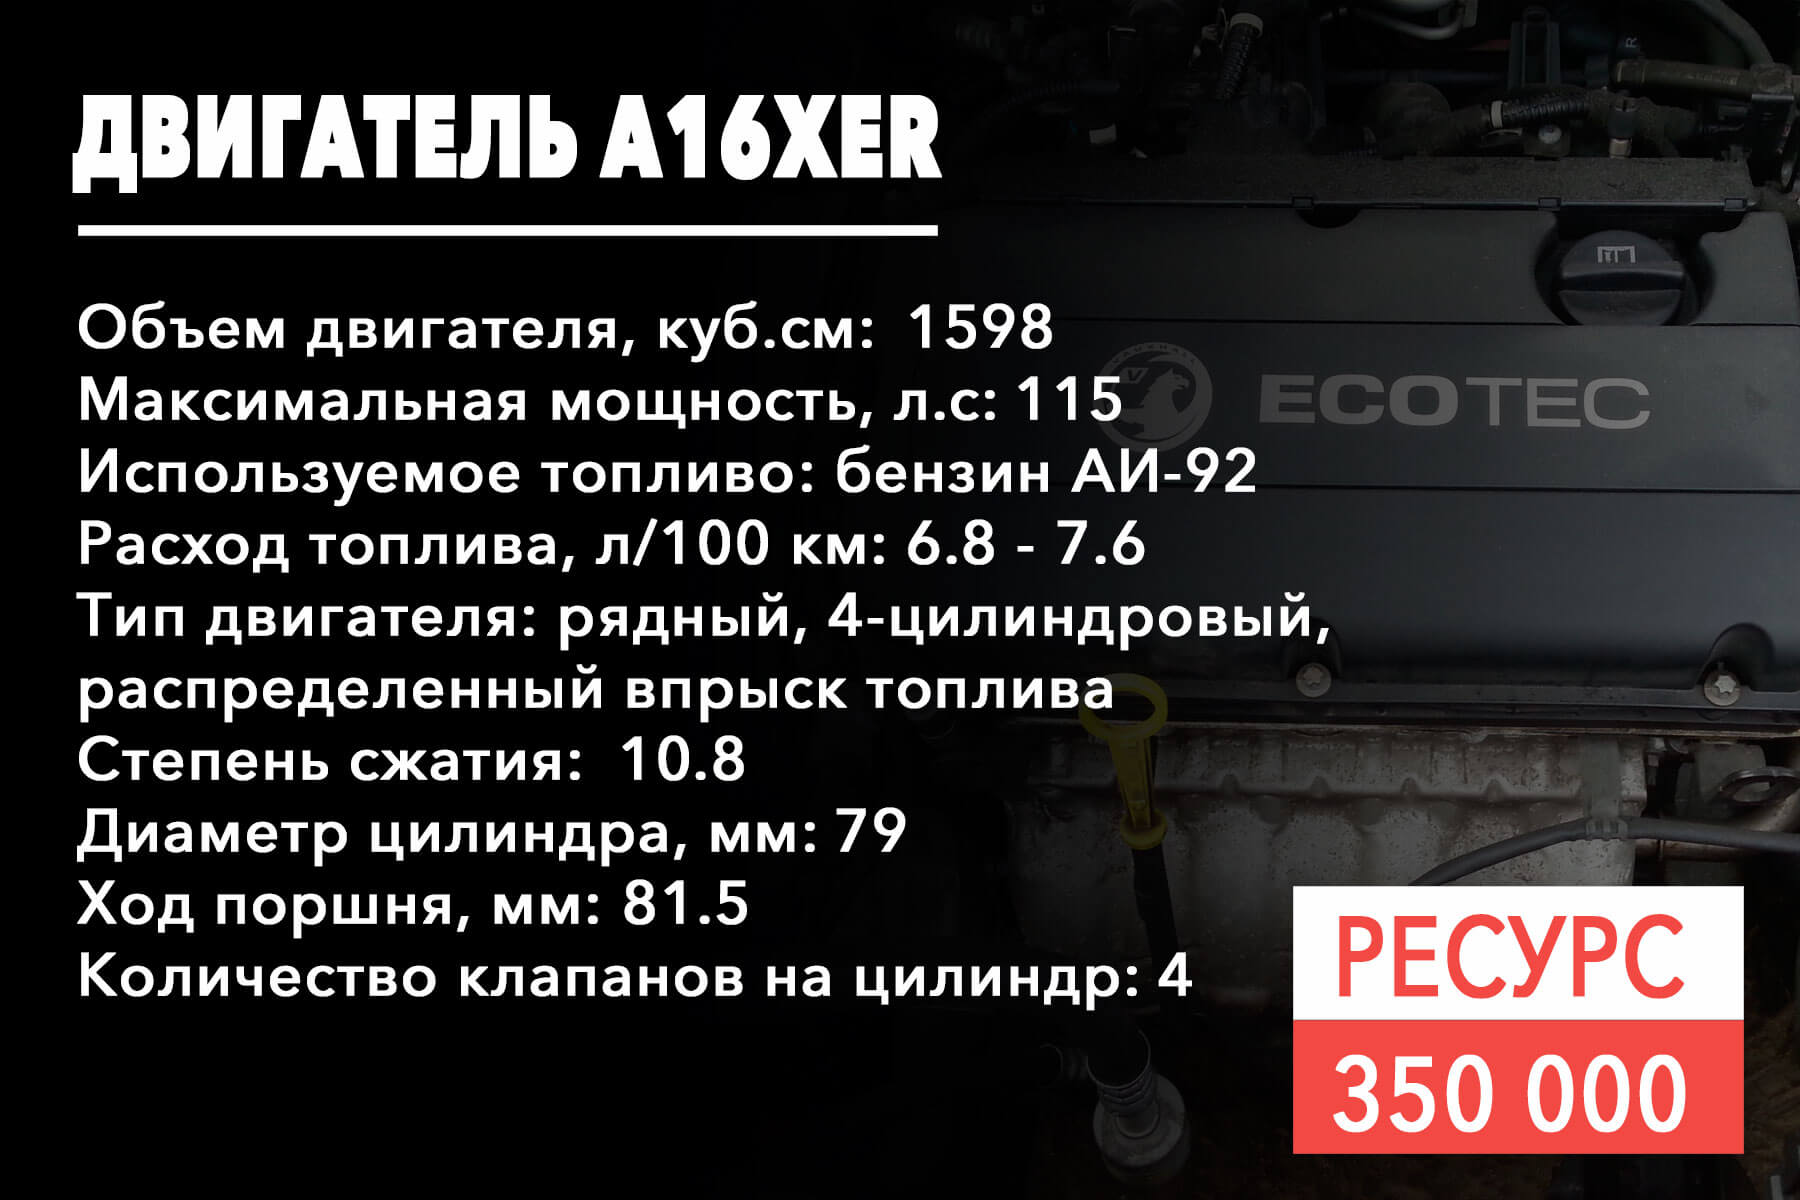 ресурс двигателя A16XER